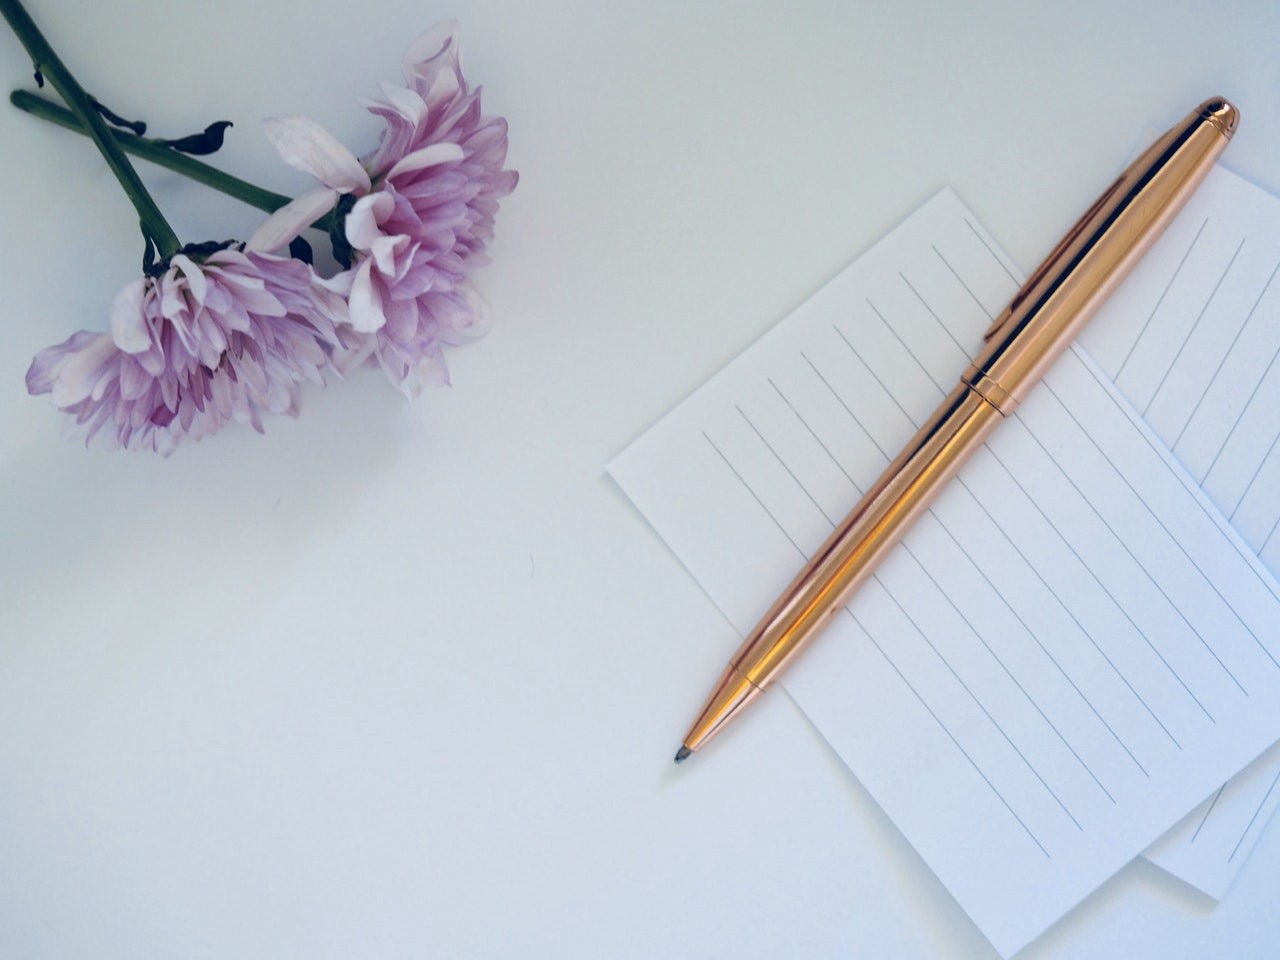 7 Ways Writing